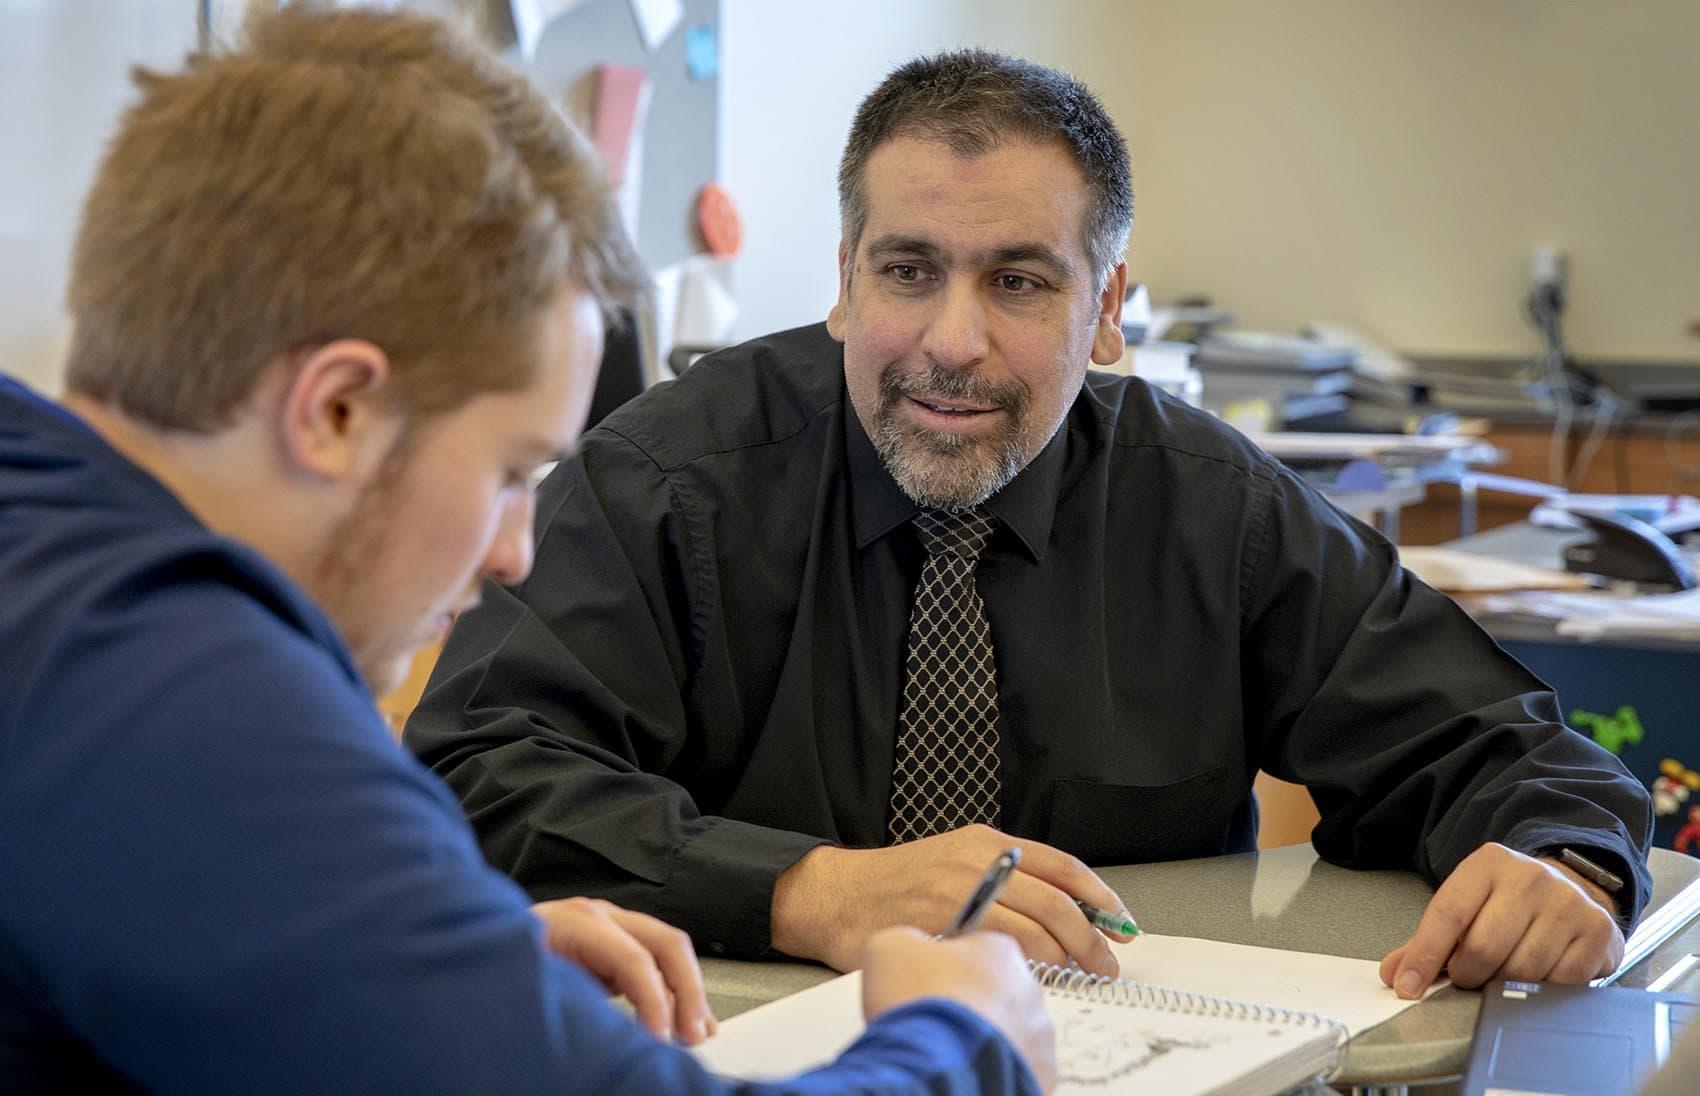 Jamil Siddiqui works on a calculus problem with senior Hunter Dempsey at East Bridgewater Junior/Senior High School. (Robin Lubbock/WBUR)